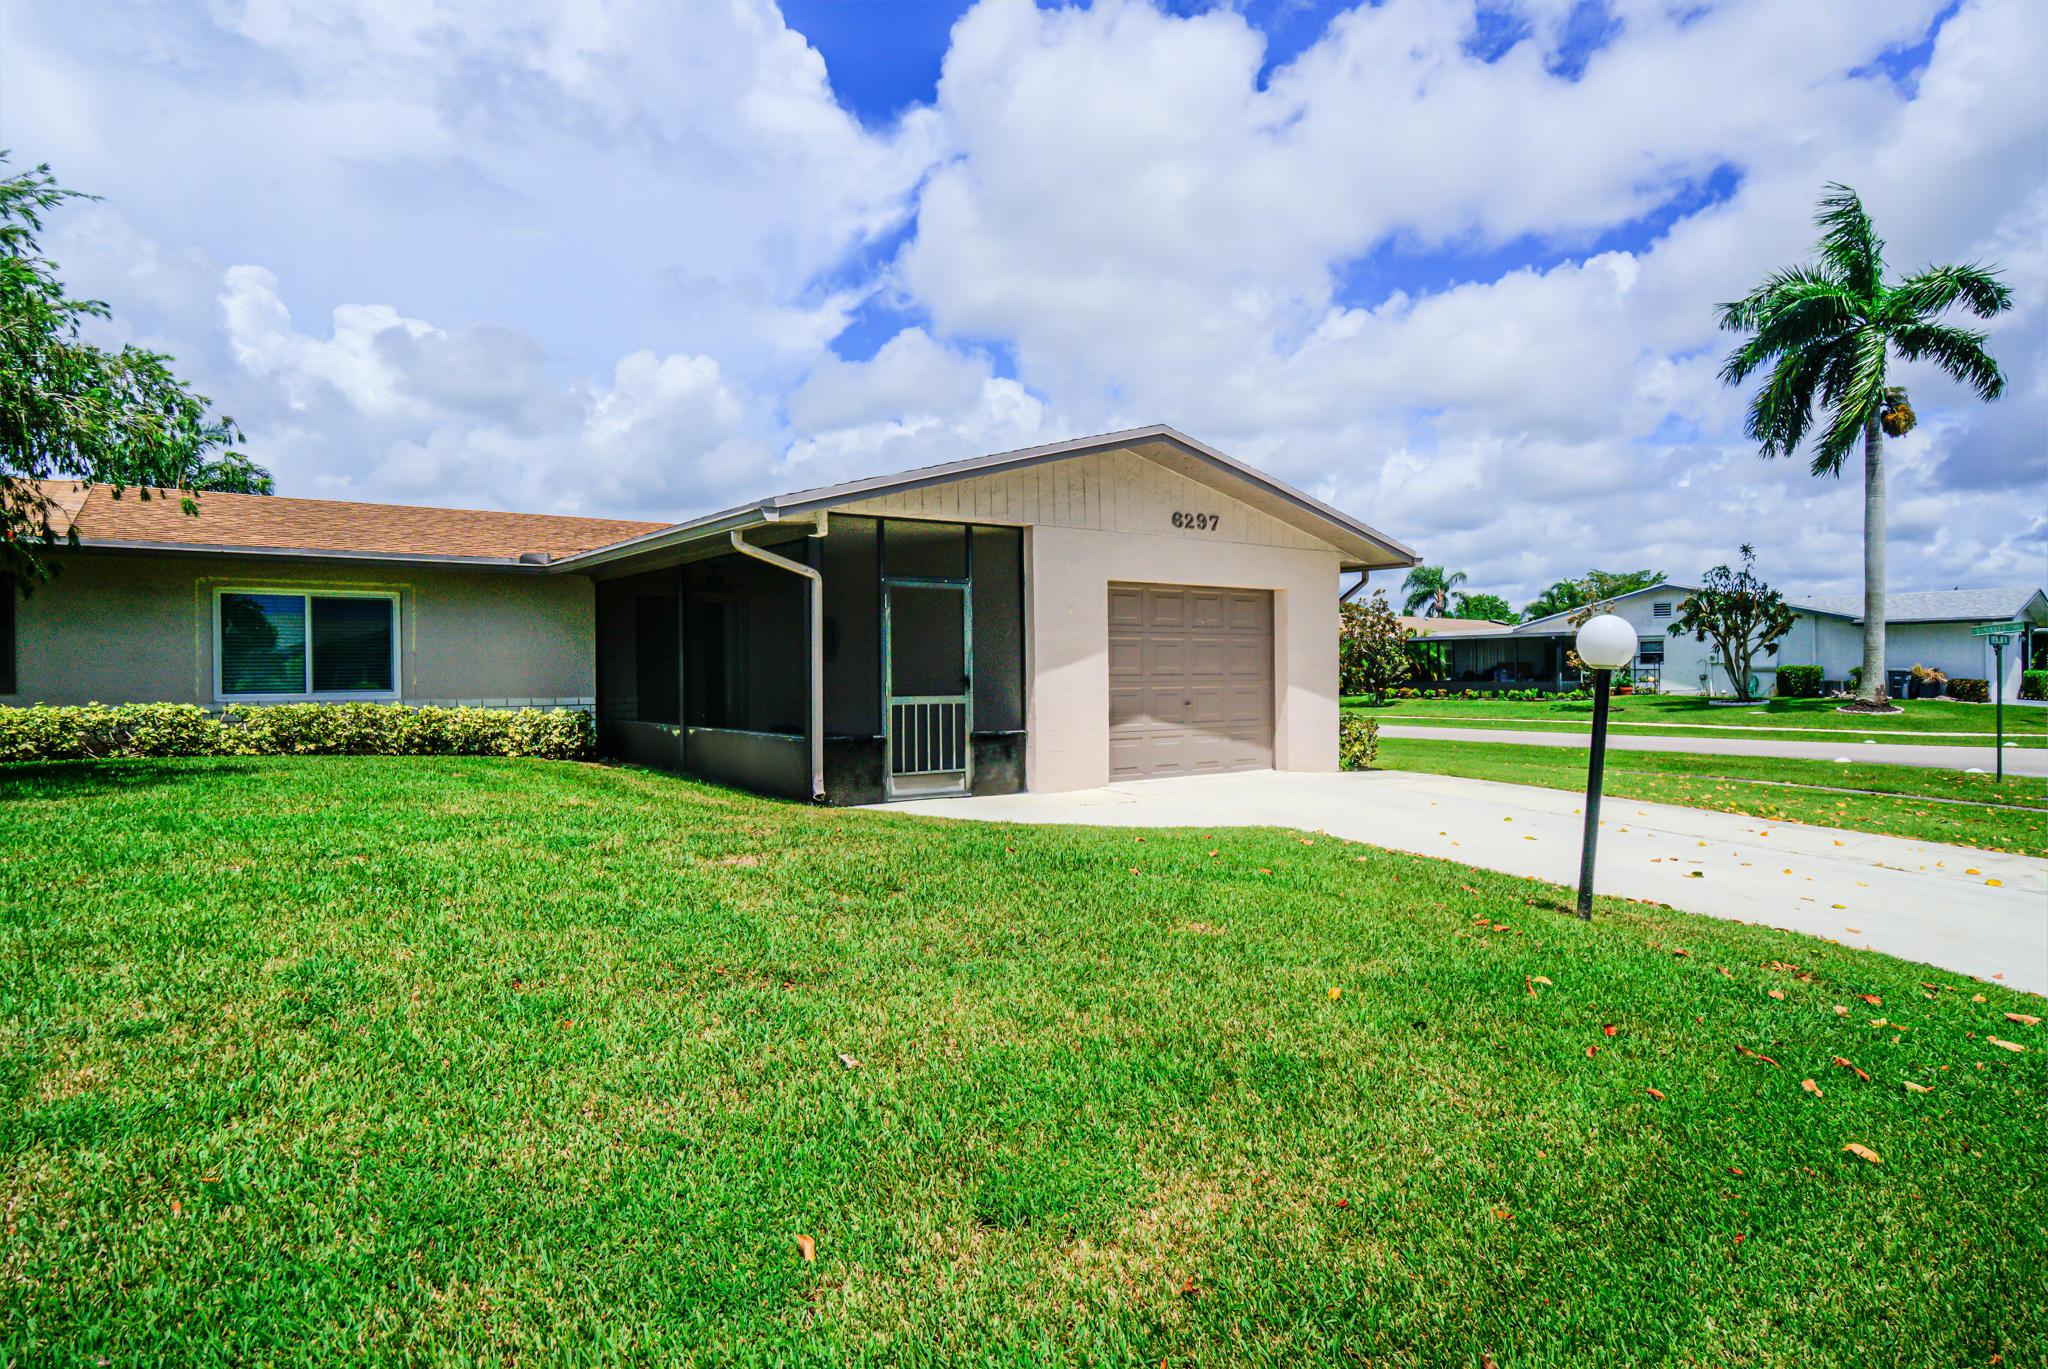 6297 Overland Drive  Delray Beach, FL 33484